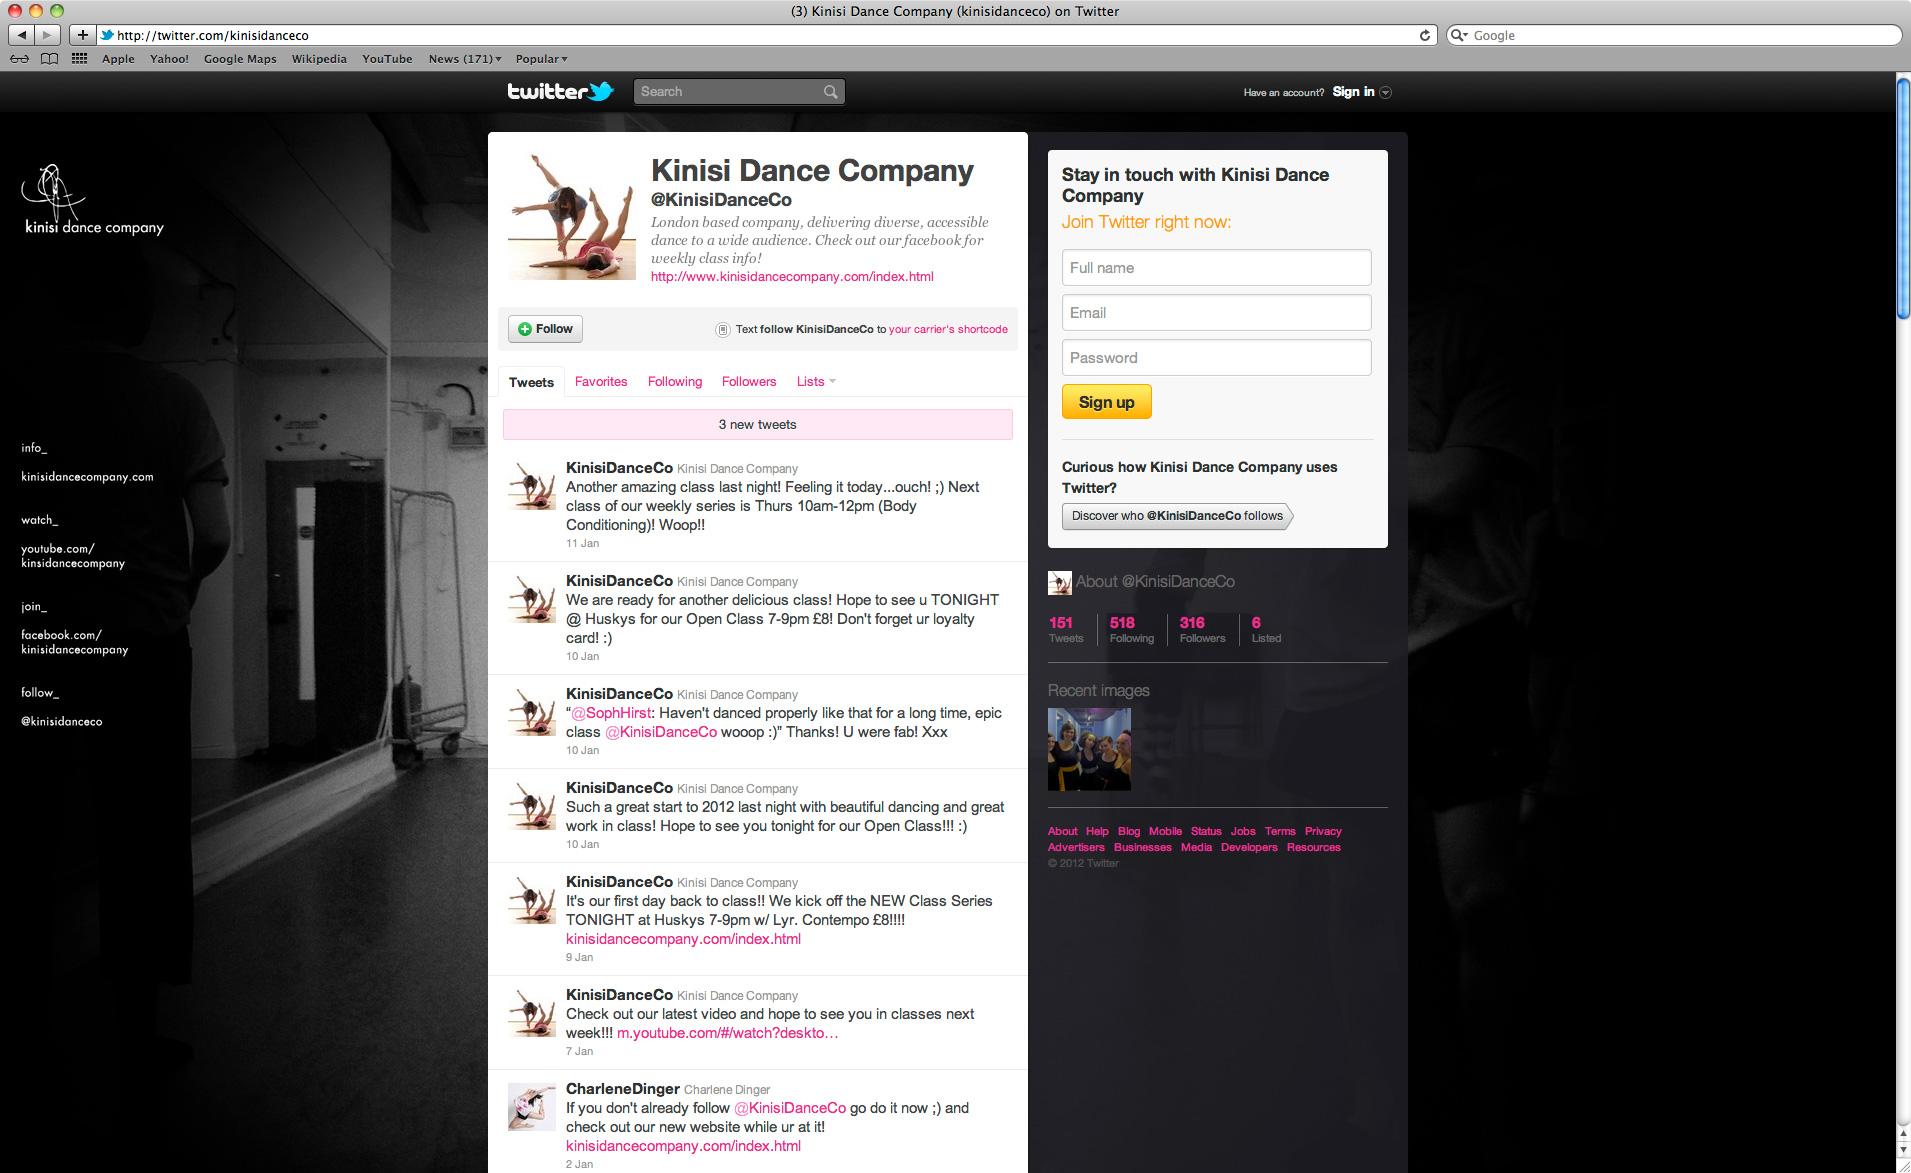 Kinisi Dance Company Twitter 1